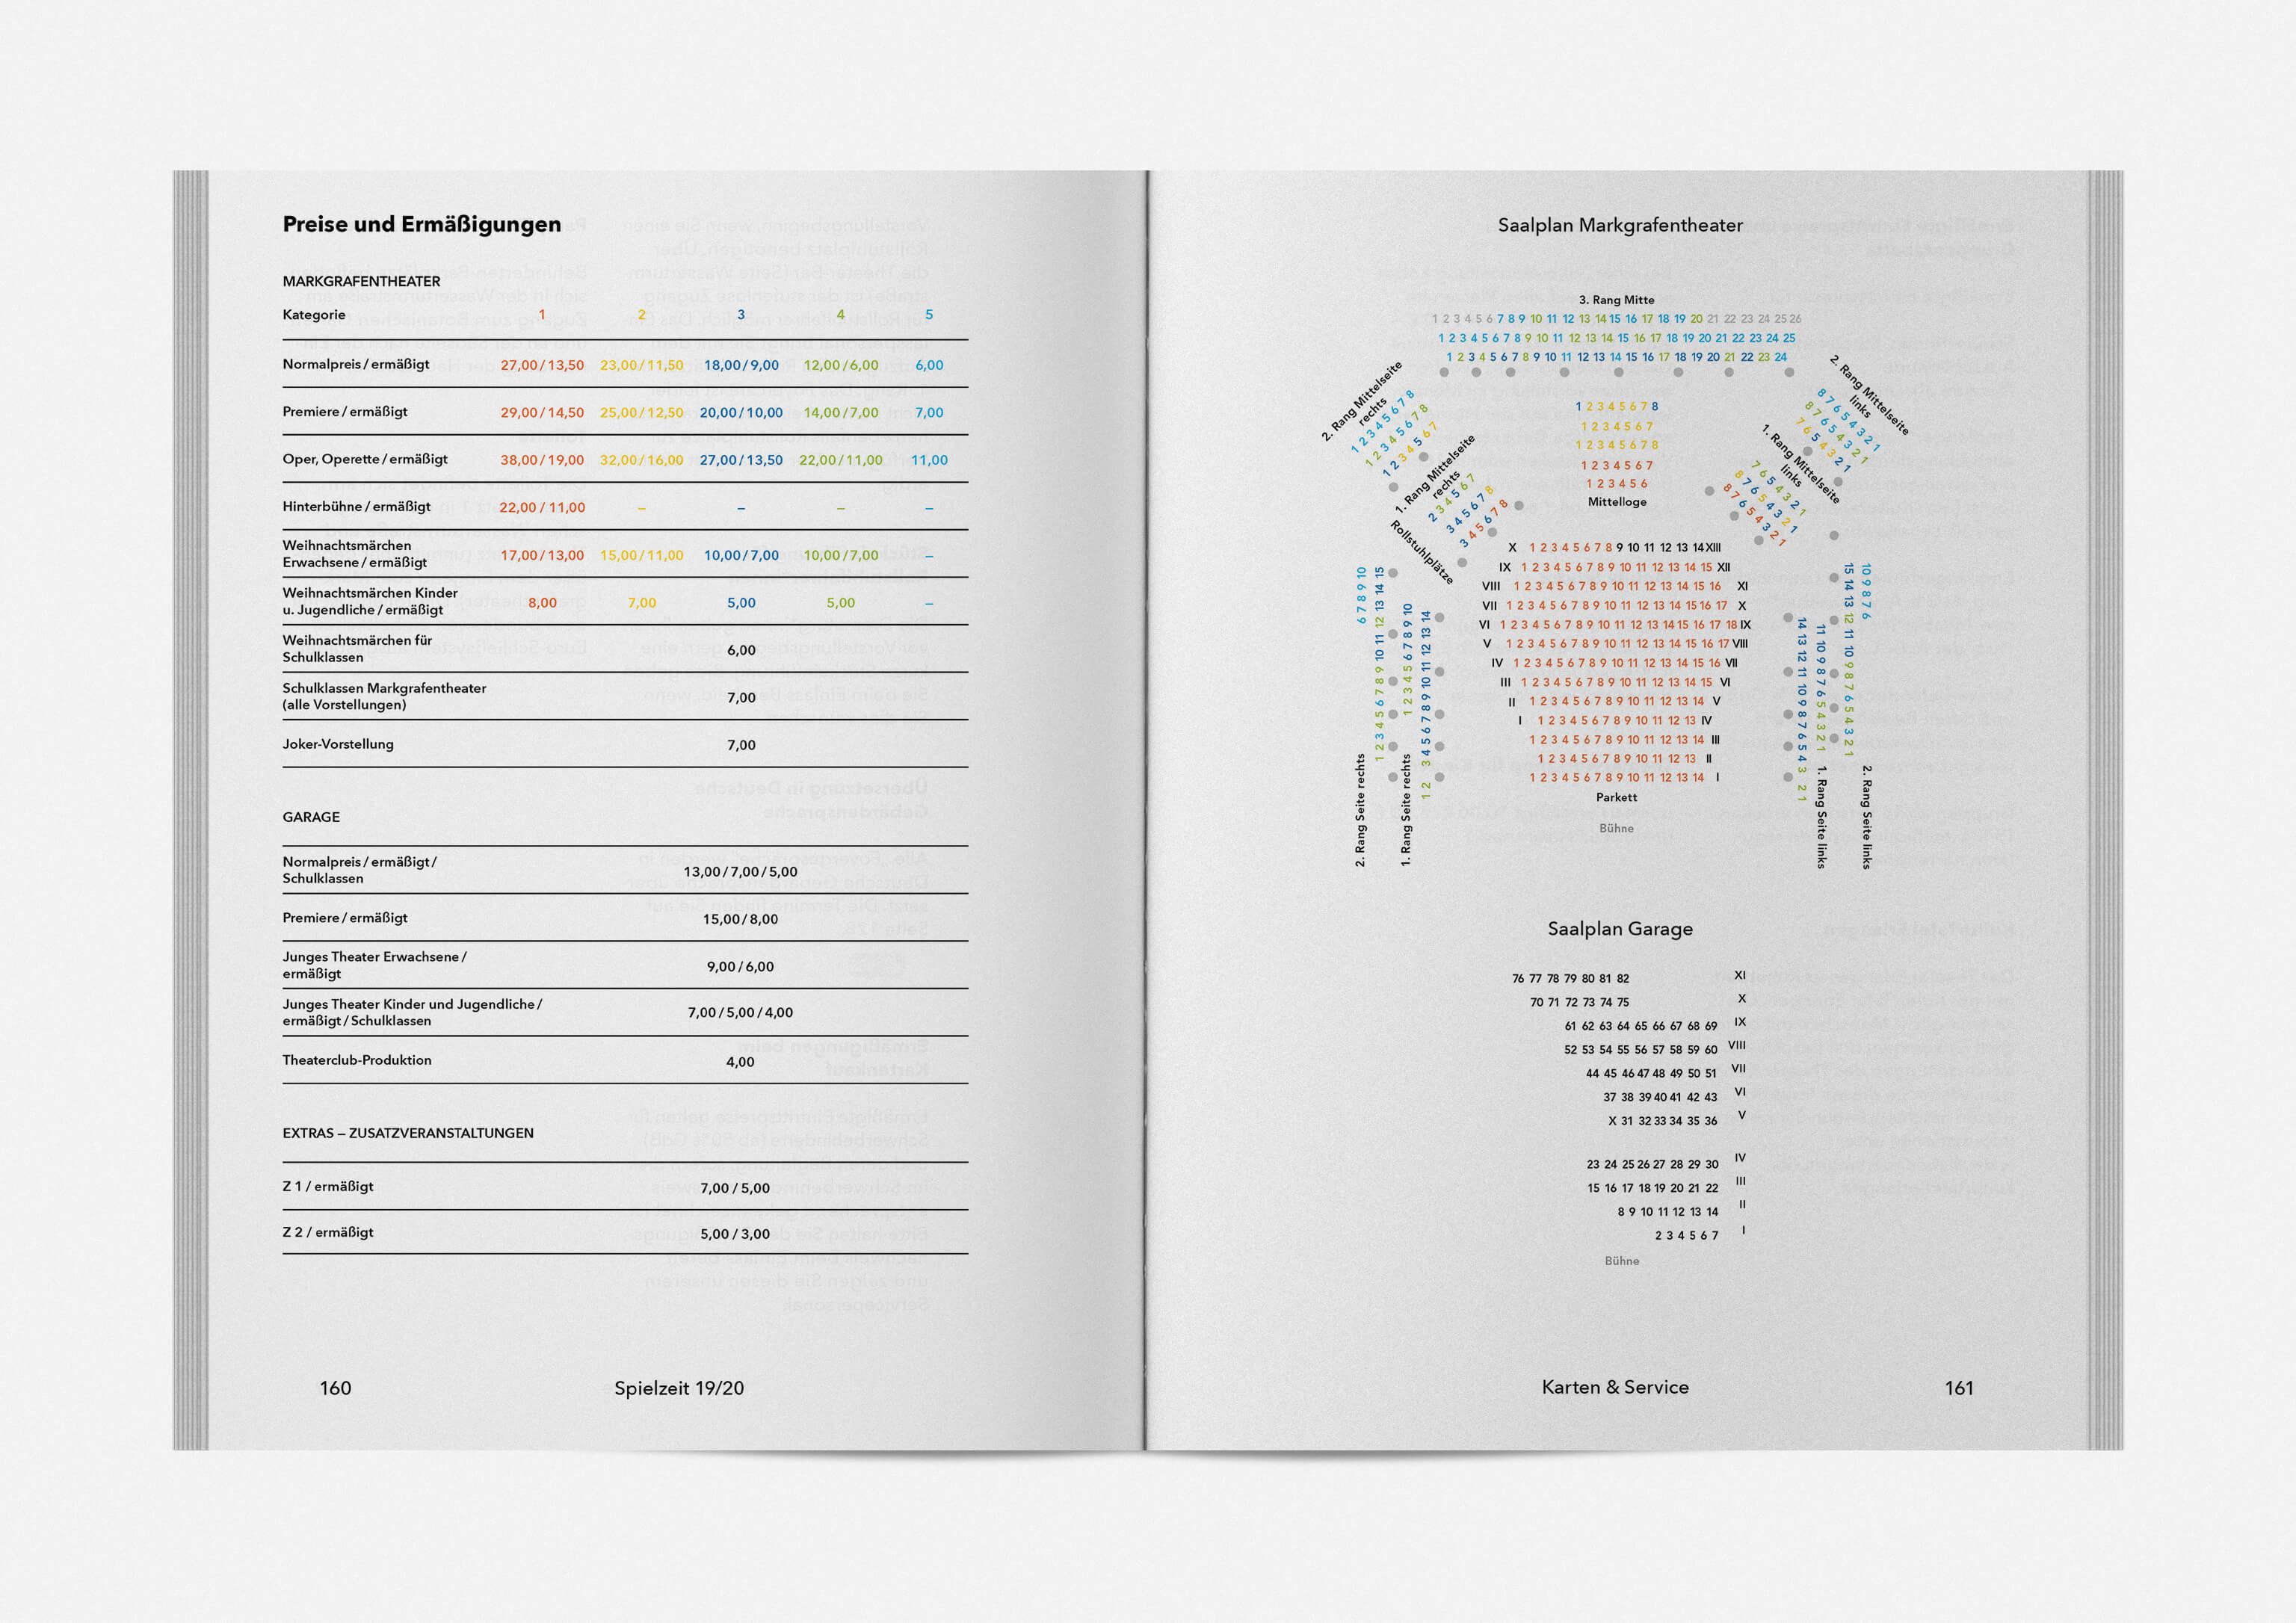 https://neuegestaltung.de/media/pages/clients/theater-erlangen-season-program-19-20/3be98cfea7-1597415332/te_szh_19_20_innenseite_160_161_ng.jpg